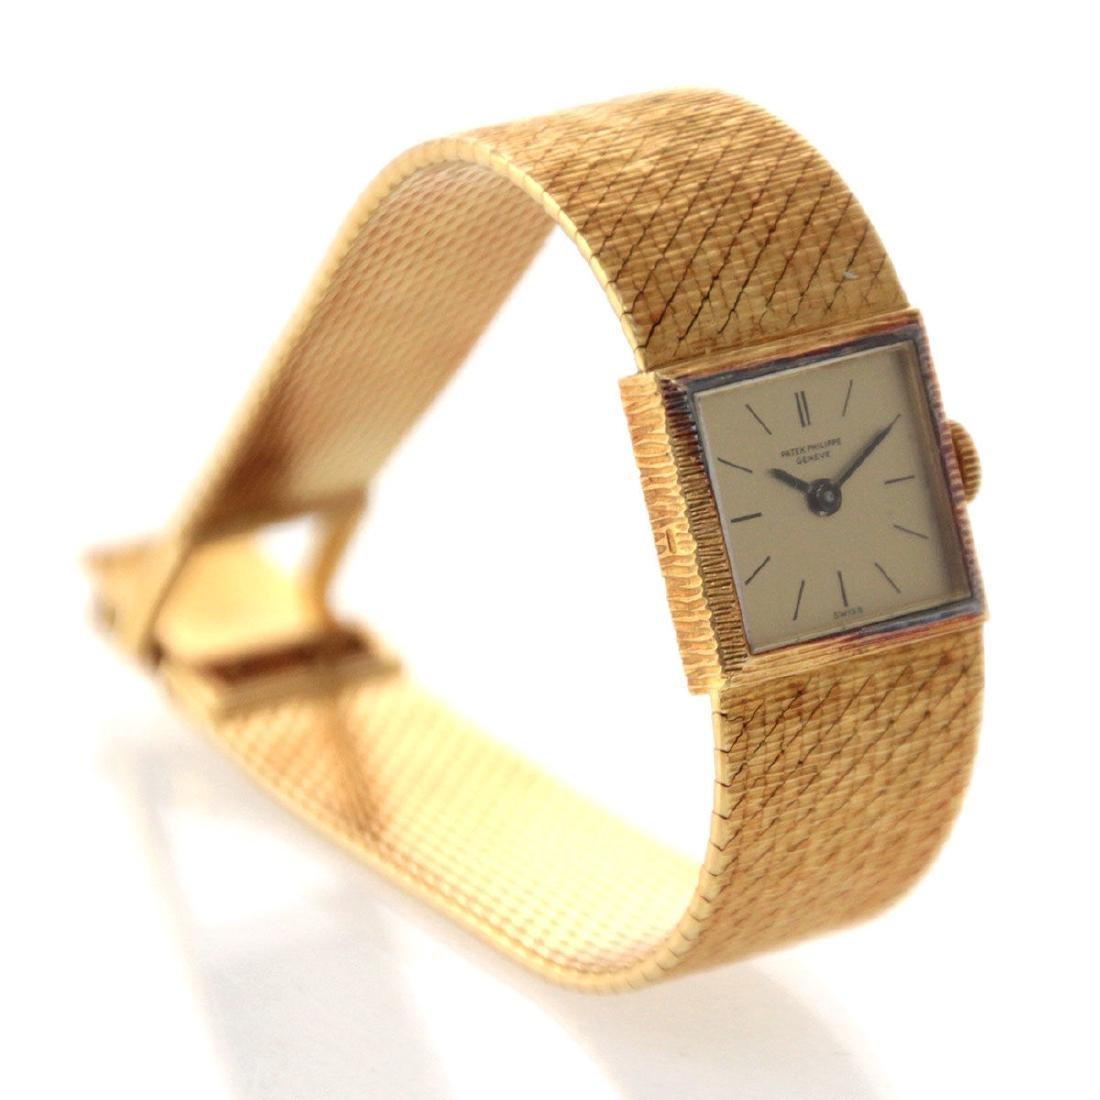 Patek Philippe Ladies 18k Yellow Gold Wrist Watch.